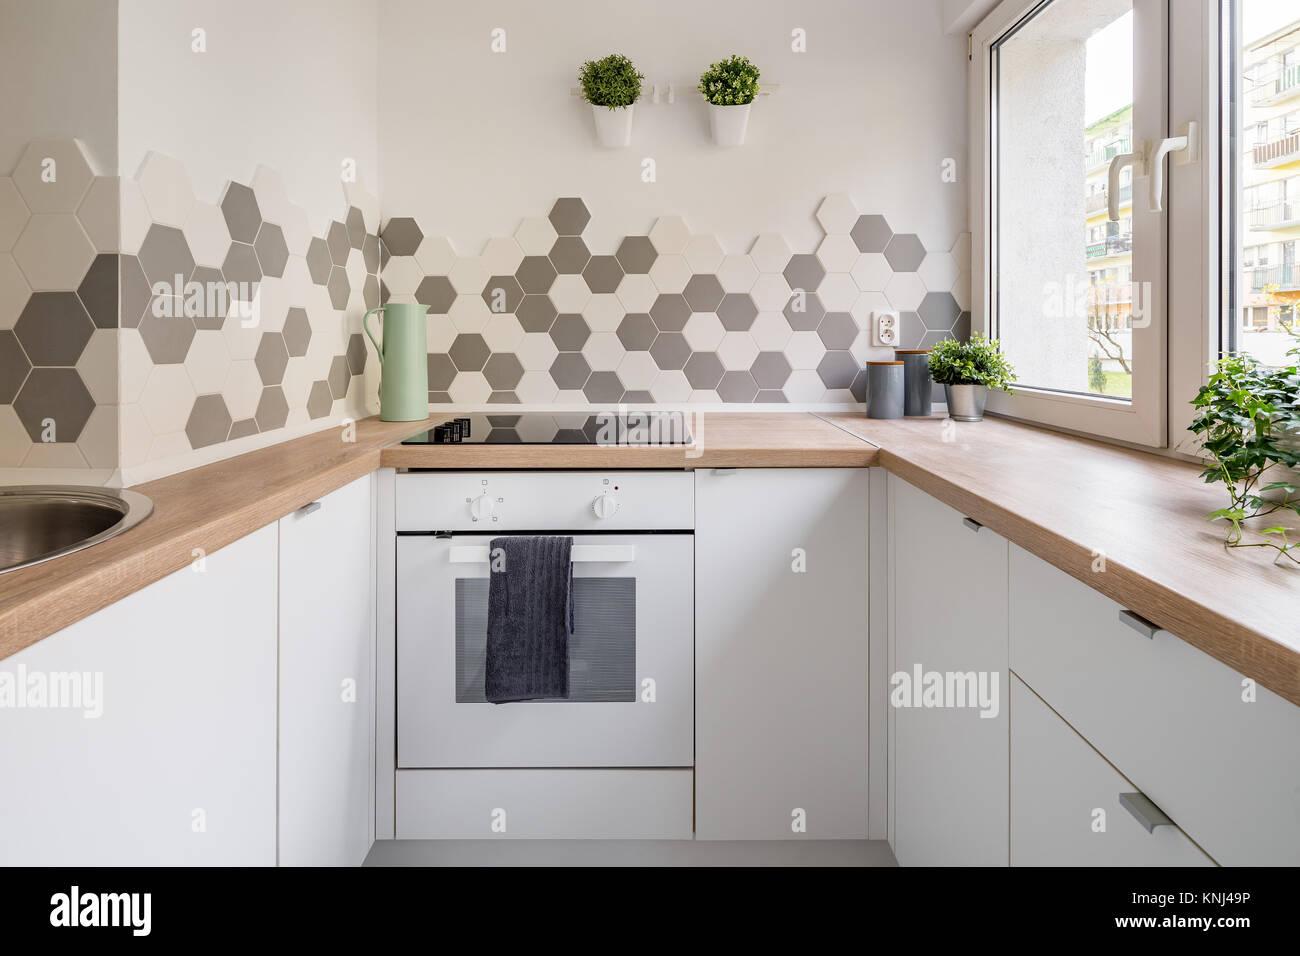 Piastrelle cucina e legno piastrelle cucina bianche best